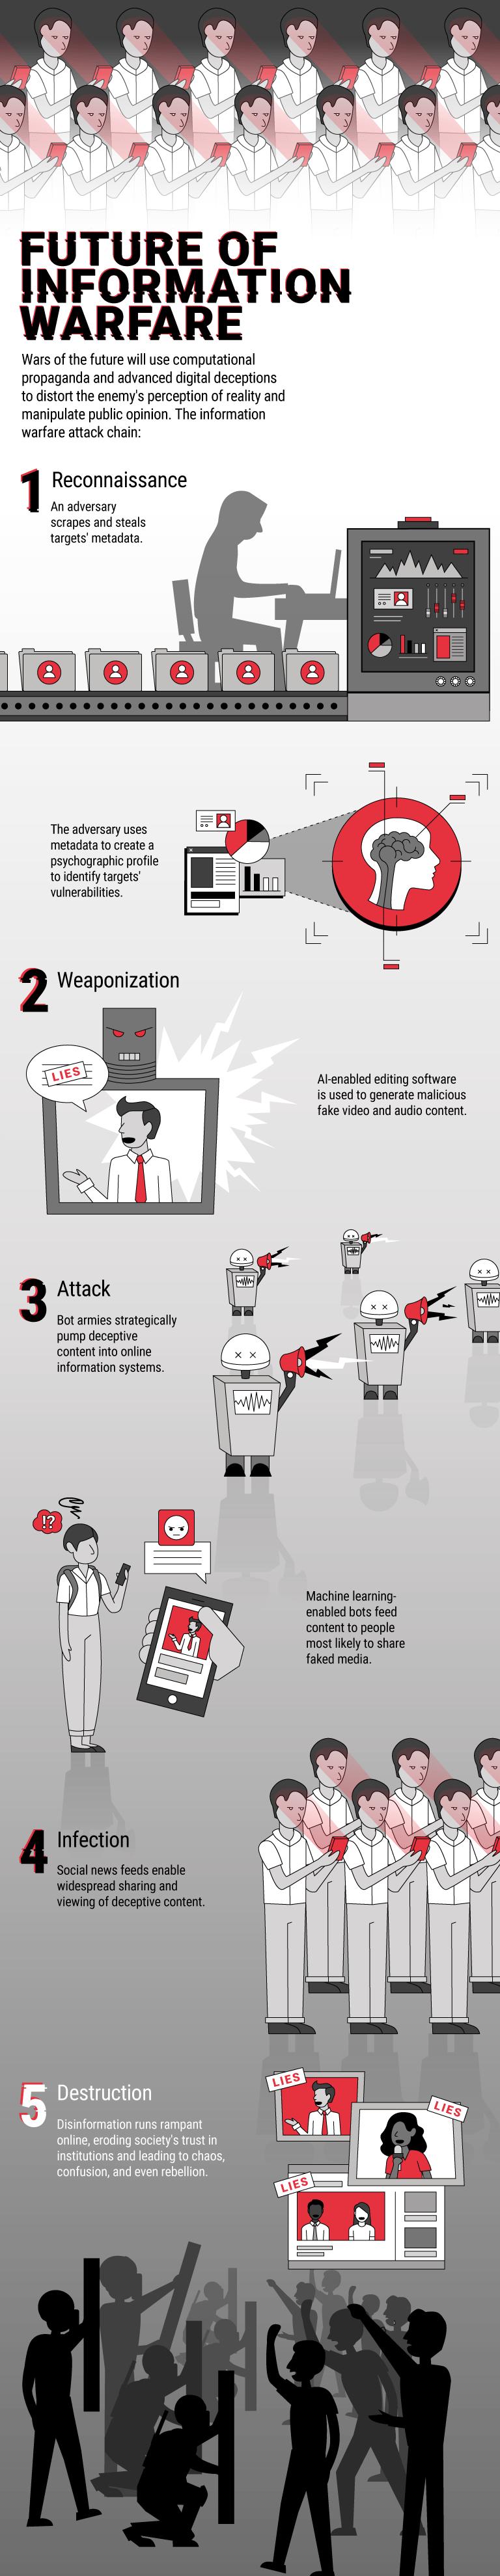 Memes That Kill: The Future Of Information Warfare